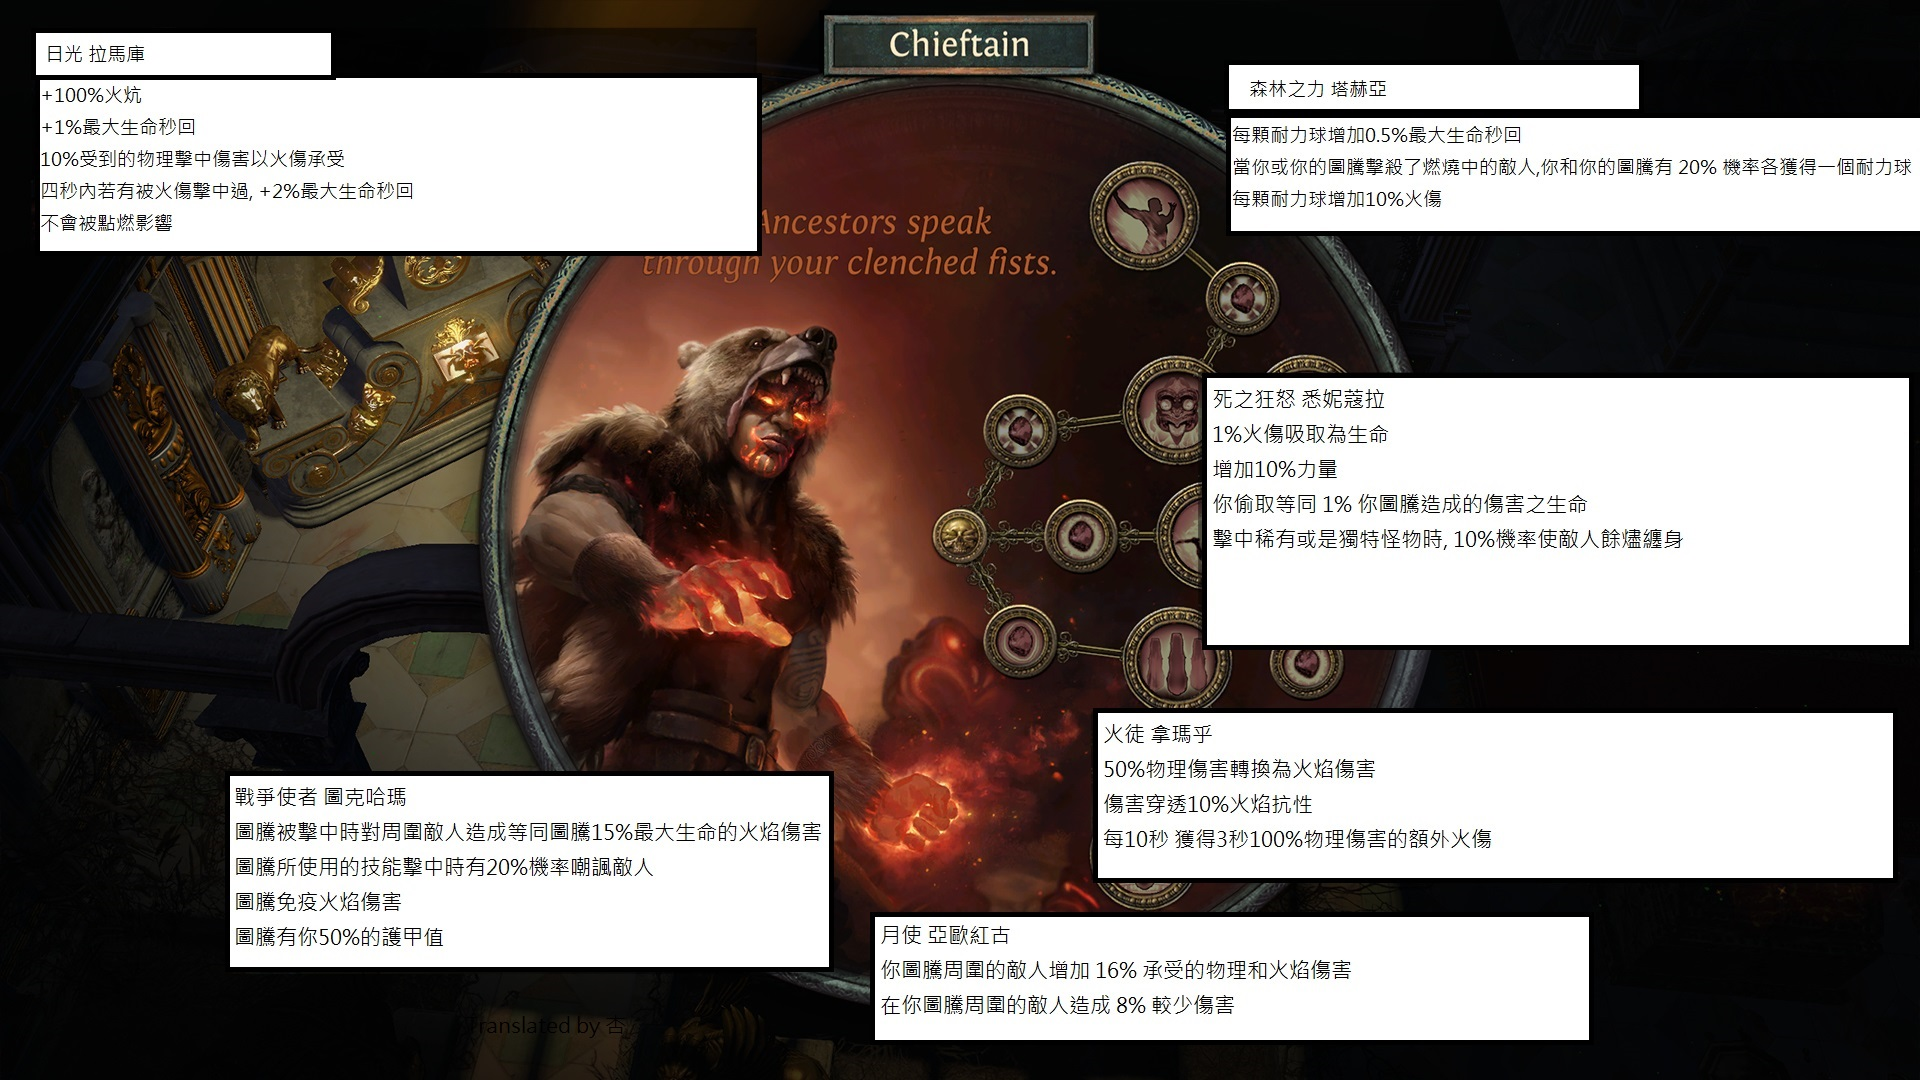 Chieftain.jpg